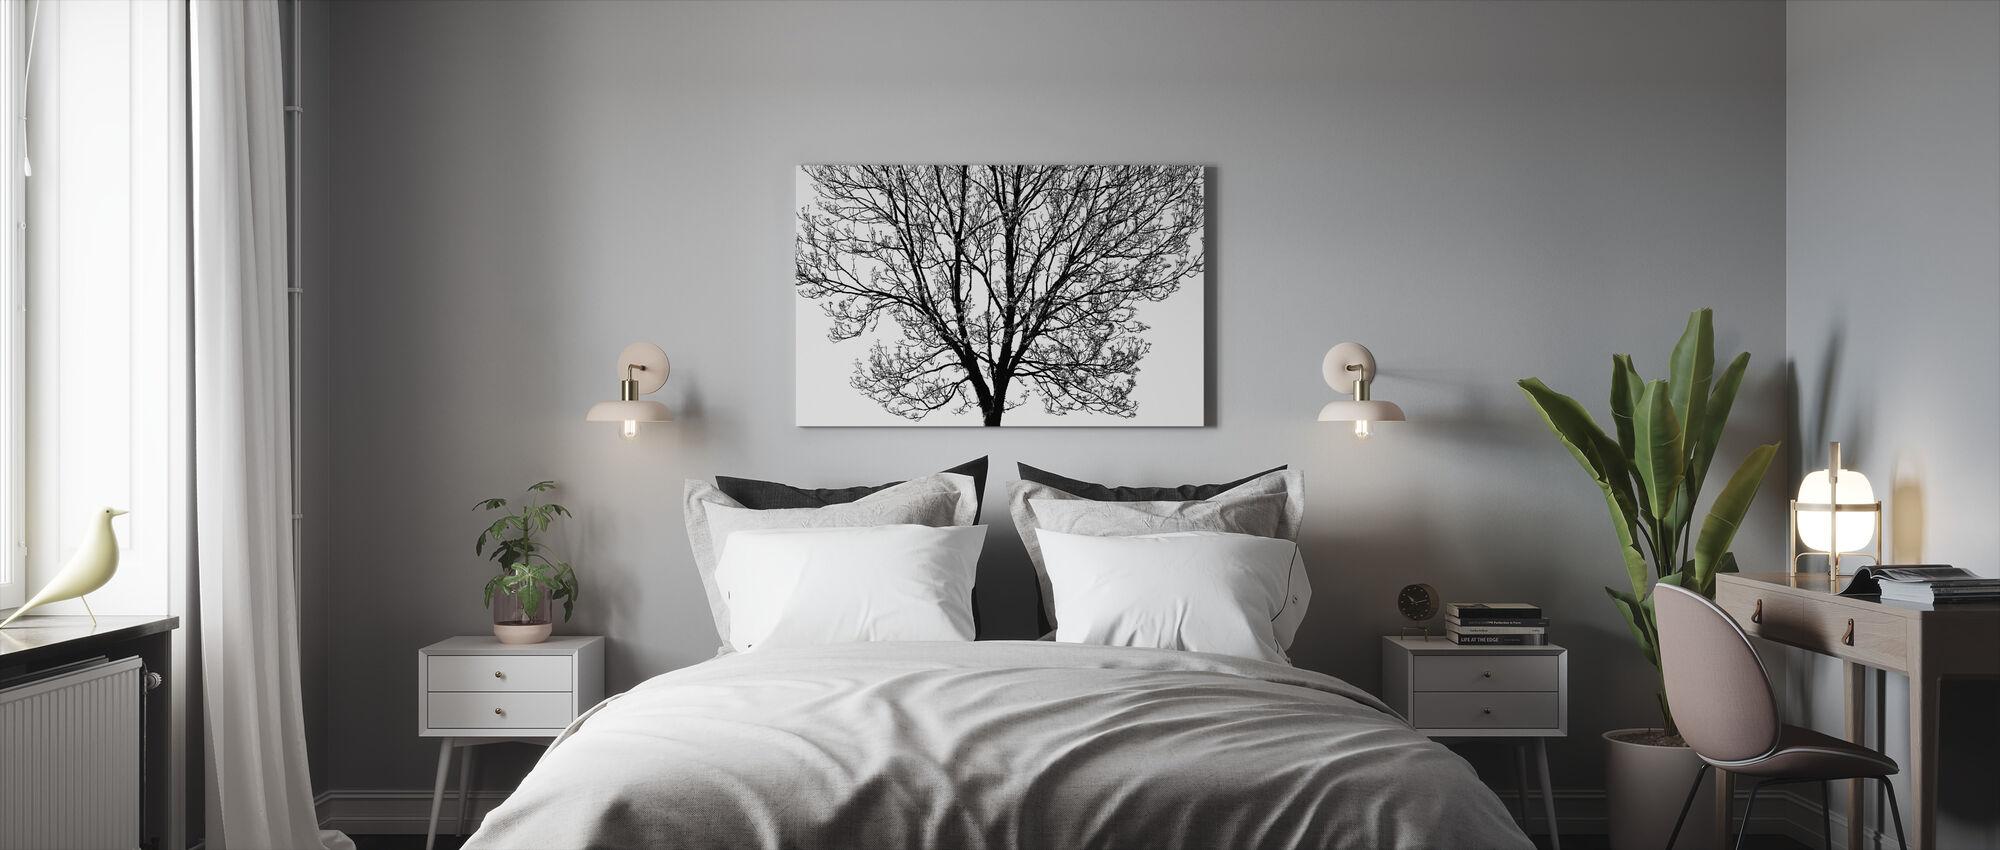 Puu Oksat 2 - Canvastaulu - Makuuhuone